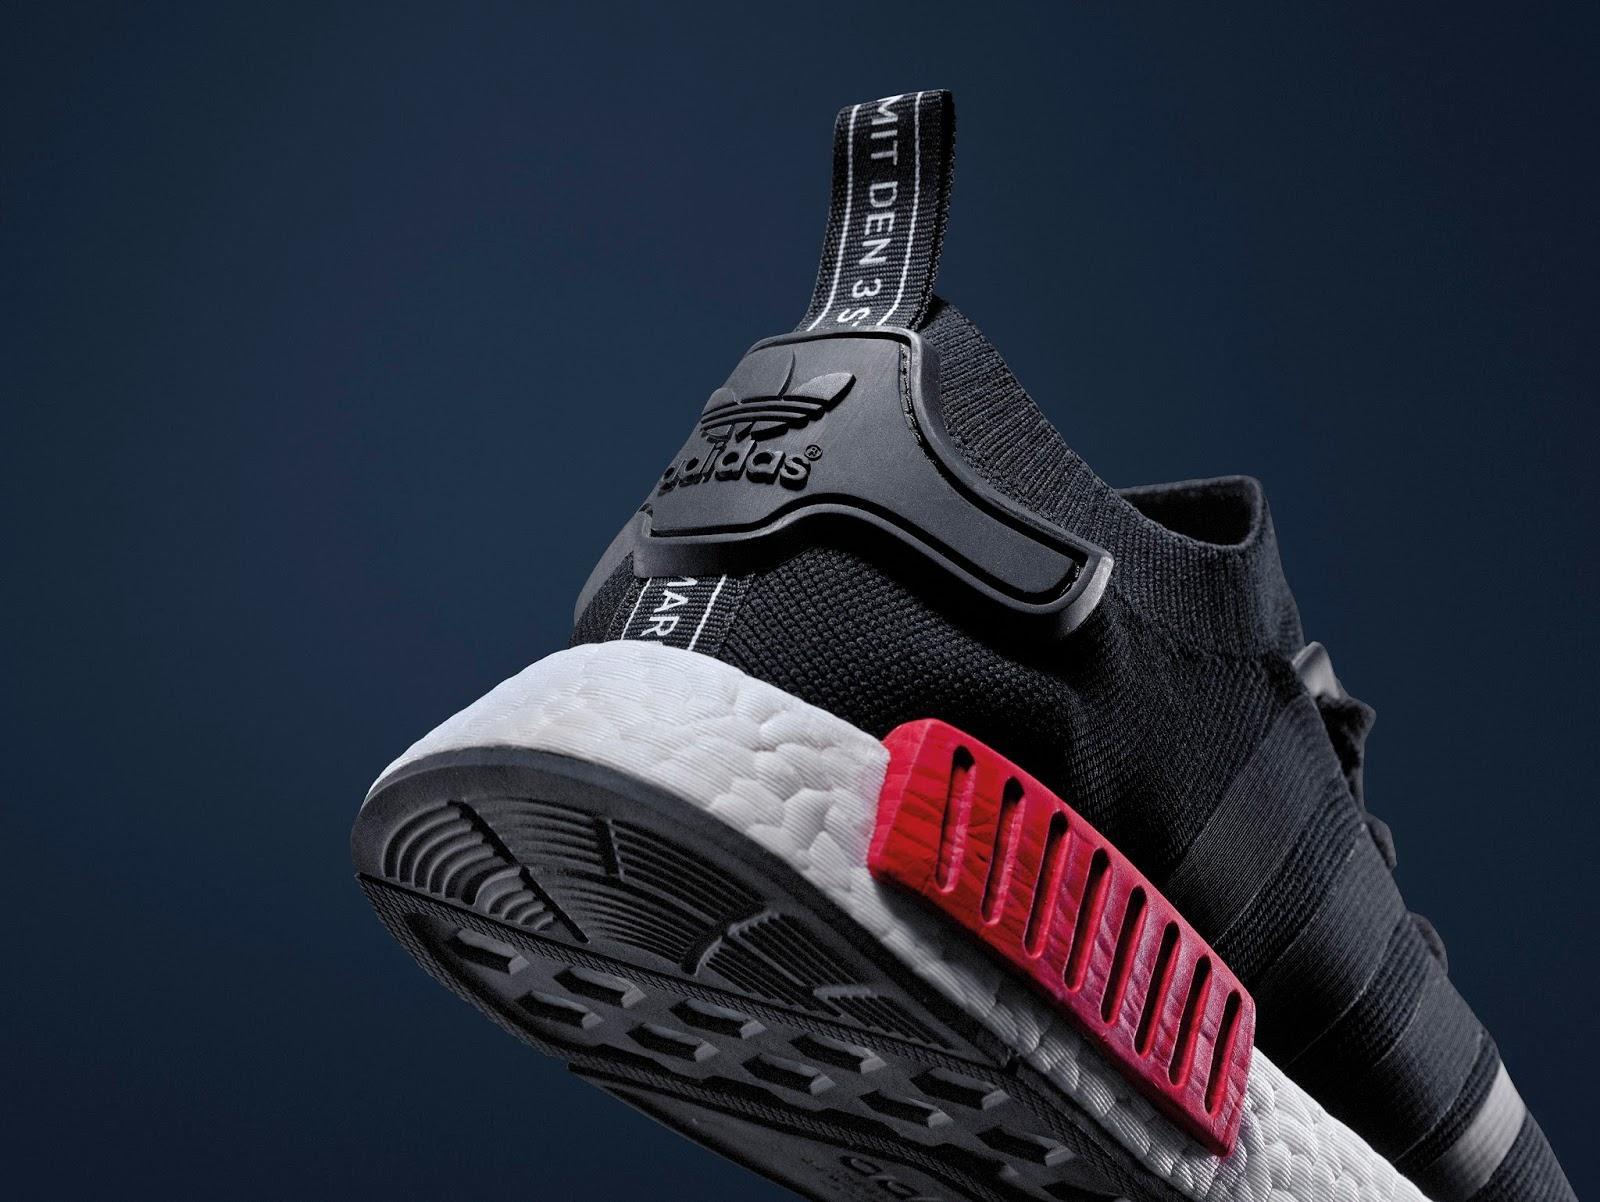 f8ec58778697 adidas nmd price philippines